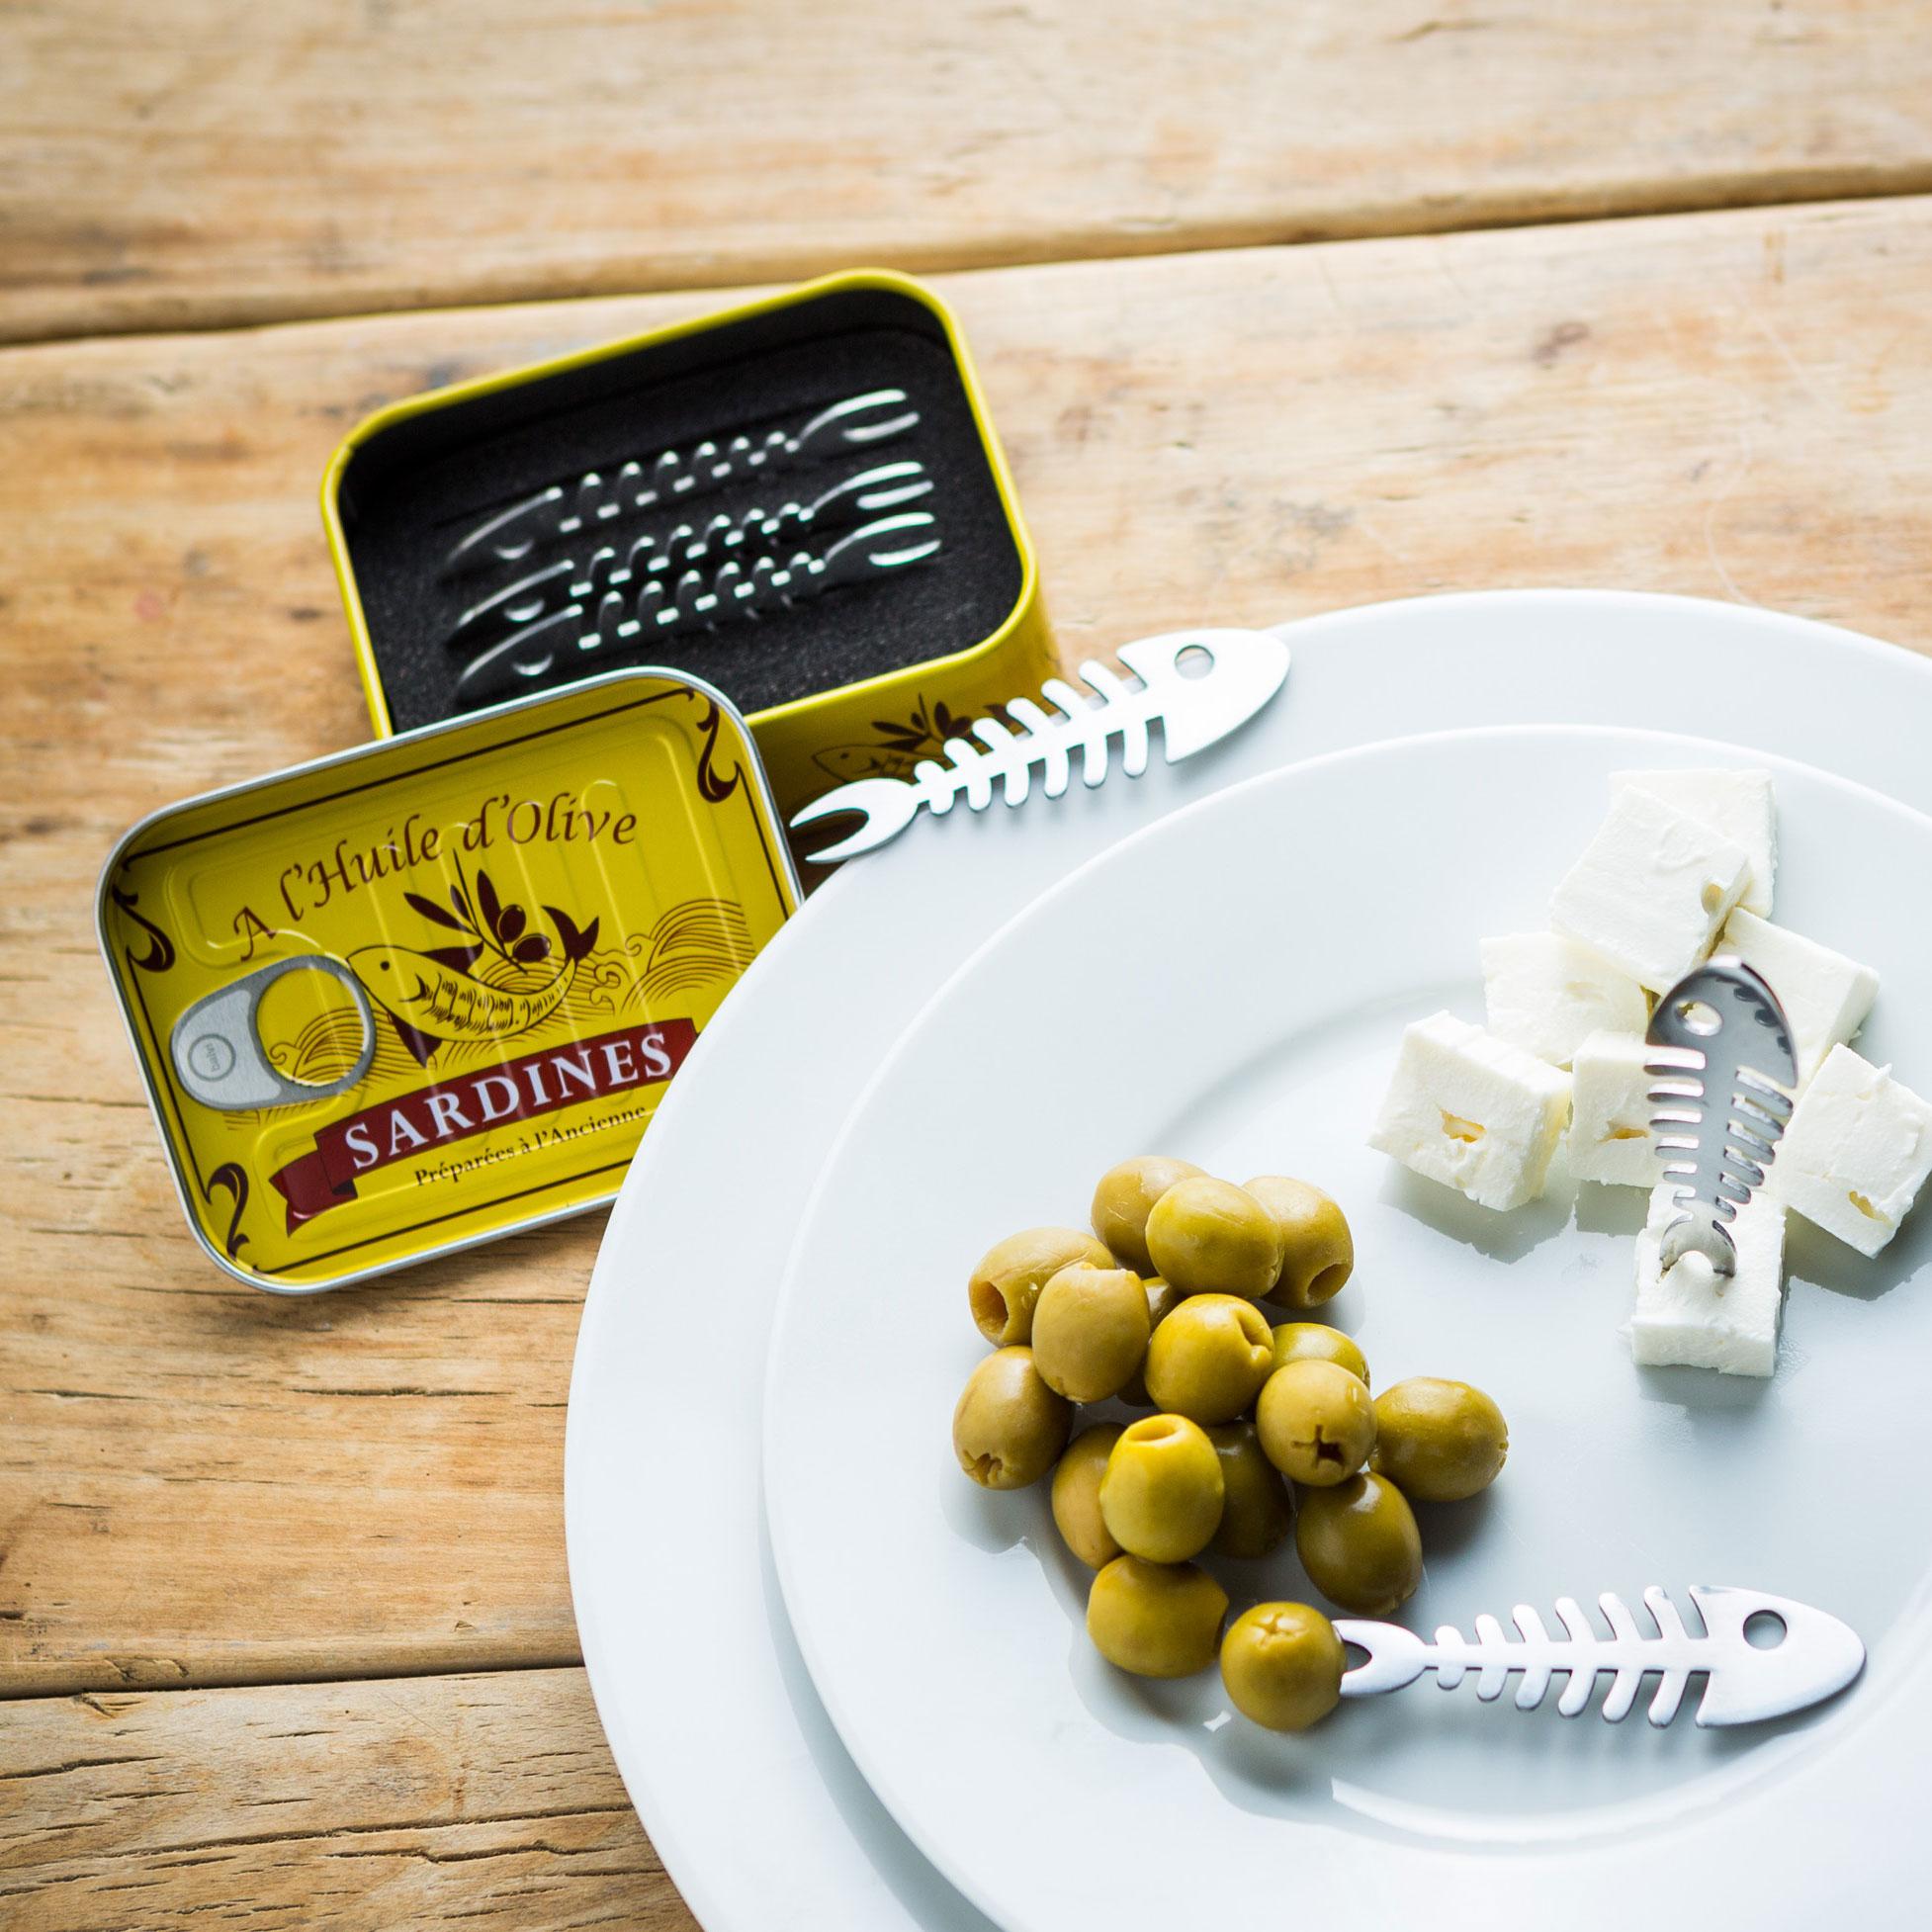 Set de 6 piques apéritif Sardines